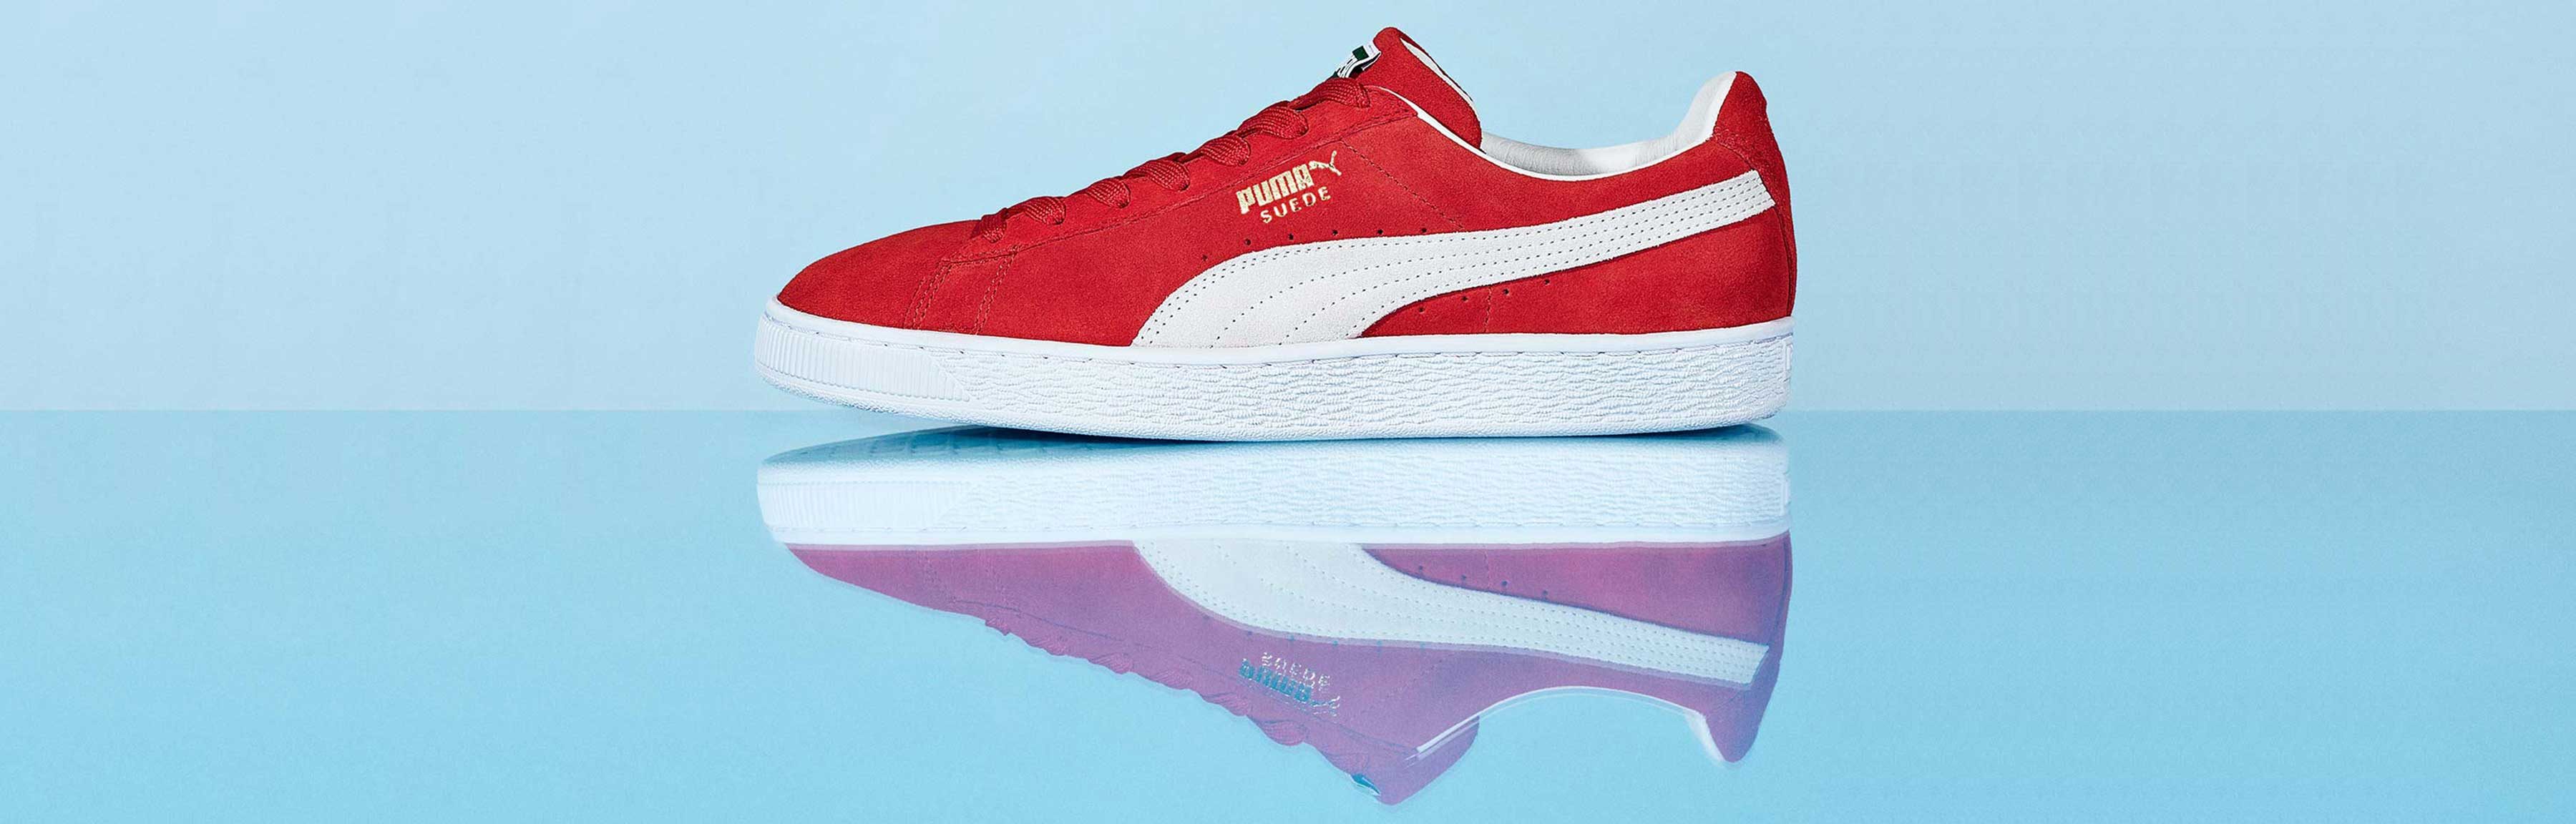 a2afe025c66 Puma Suede Classic online kopen | Puma sneakers | Zalando